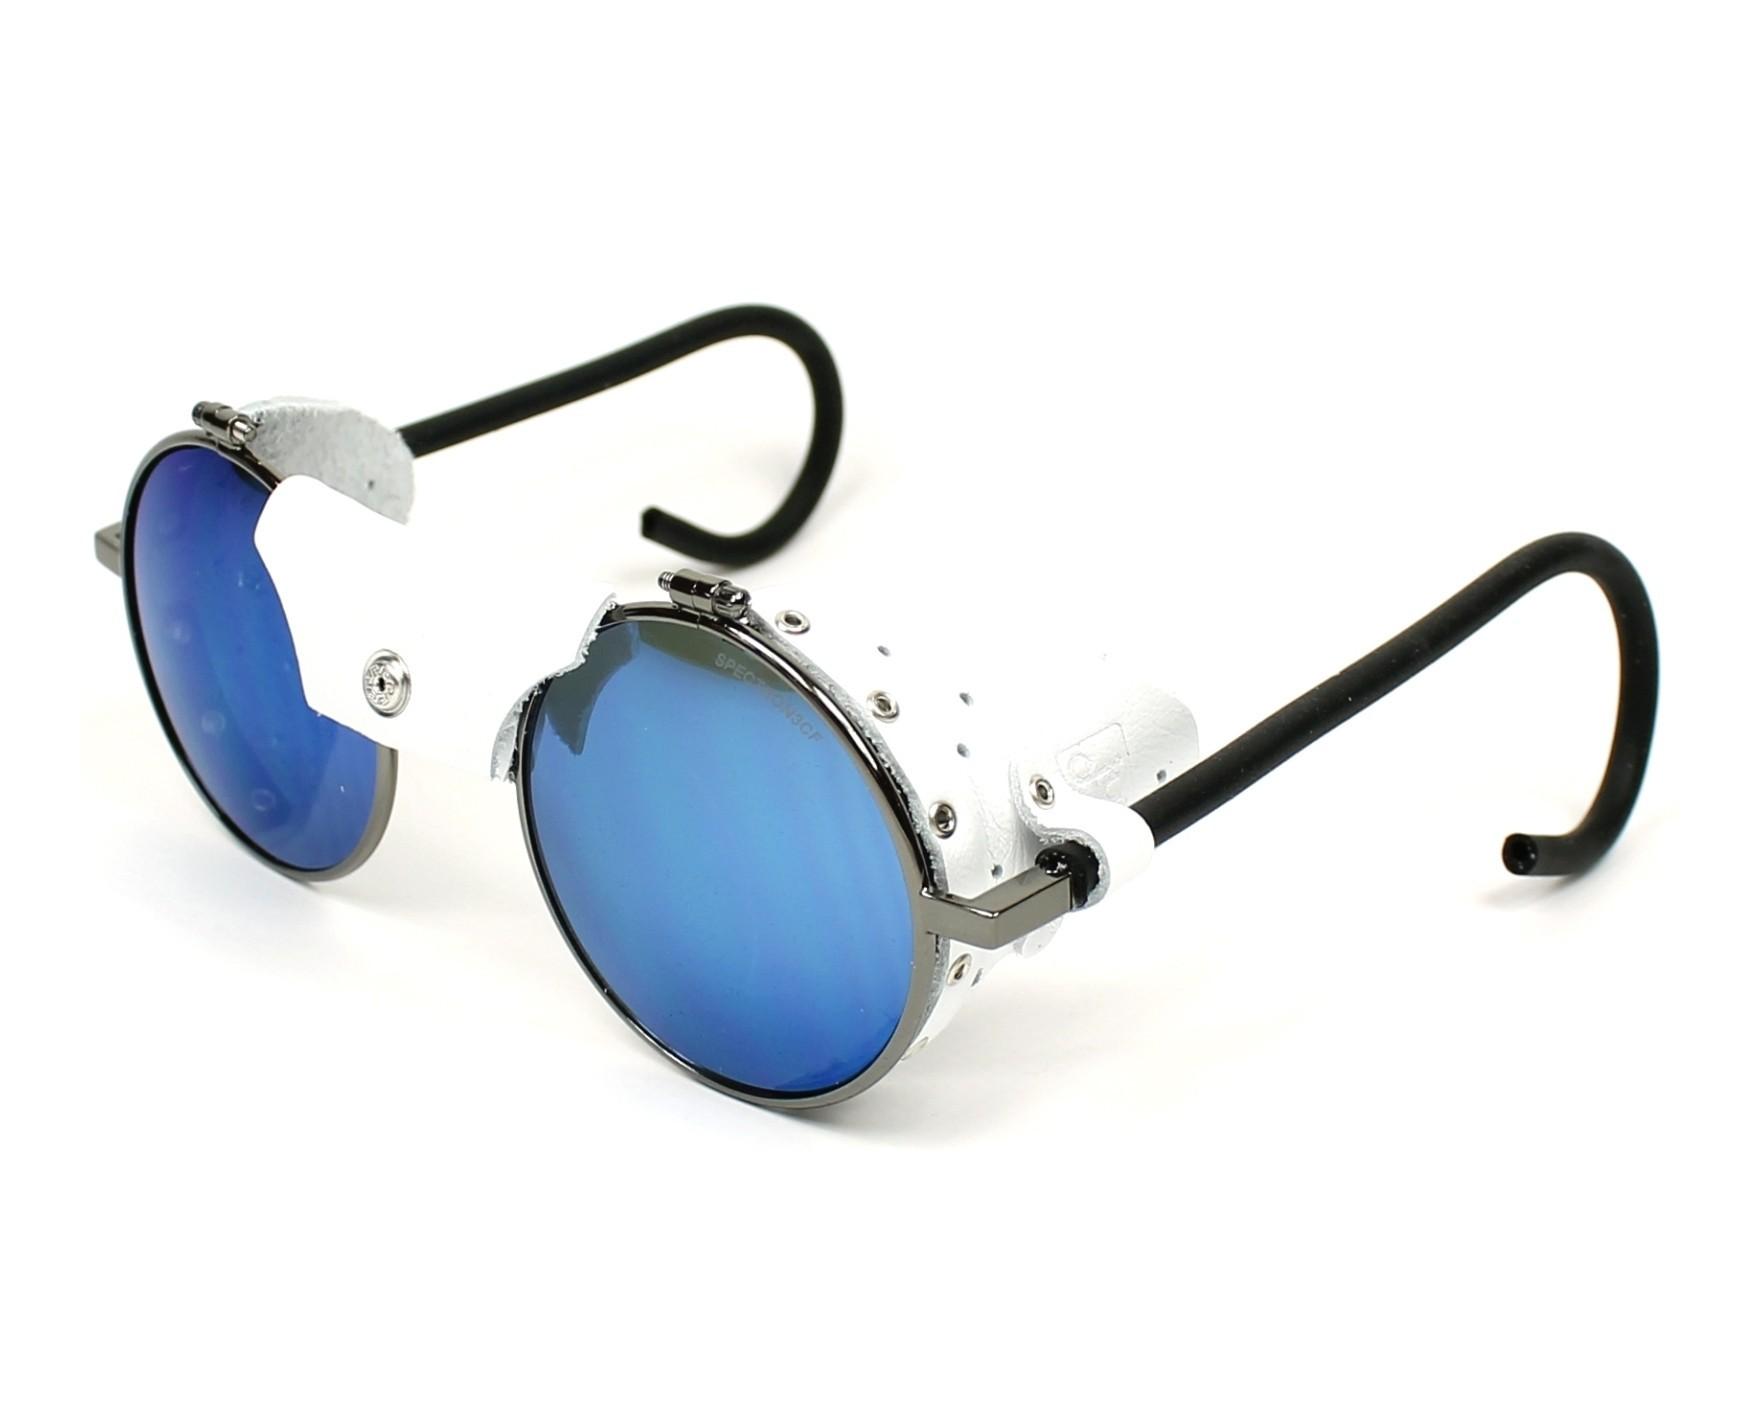 f90afad371f Julbo Vermont Classic Spectron 4 Sunglasses Black